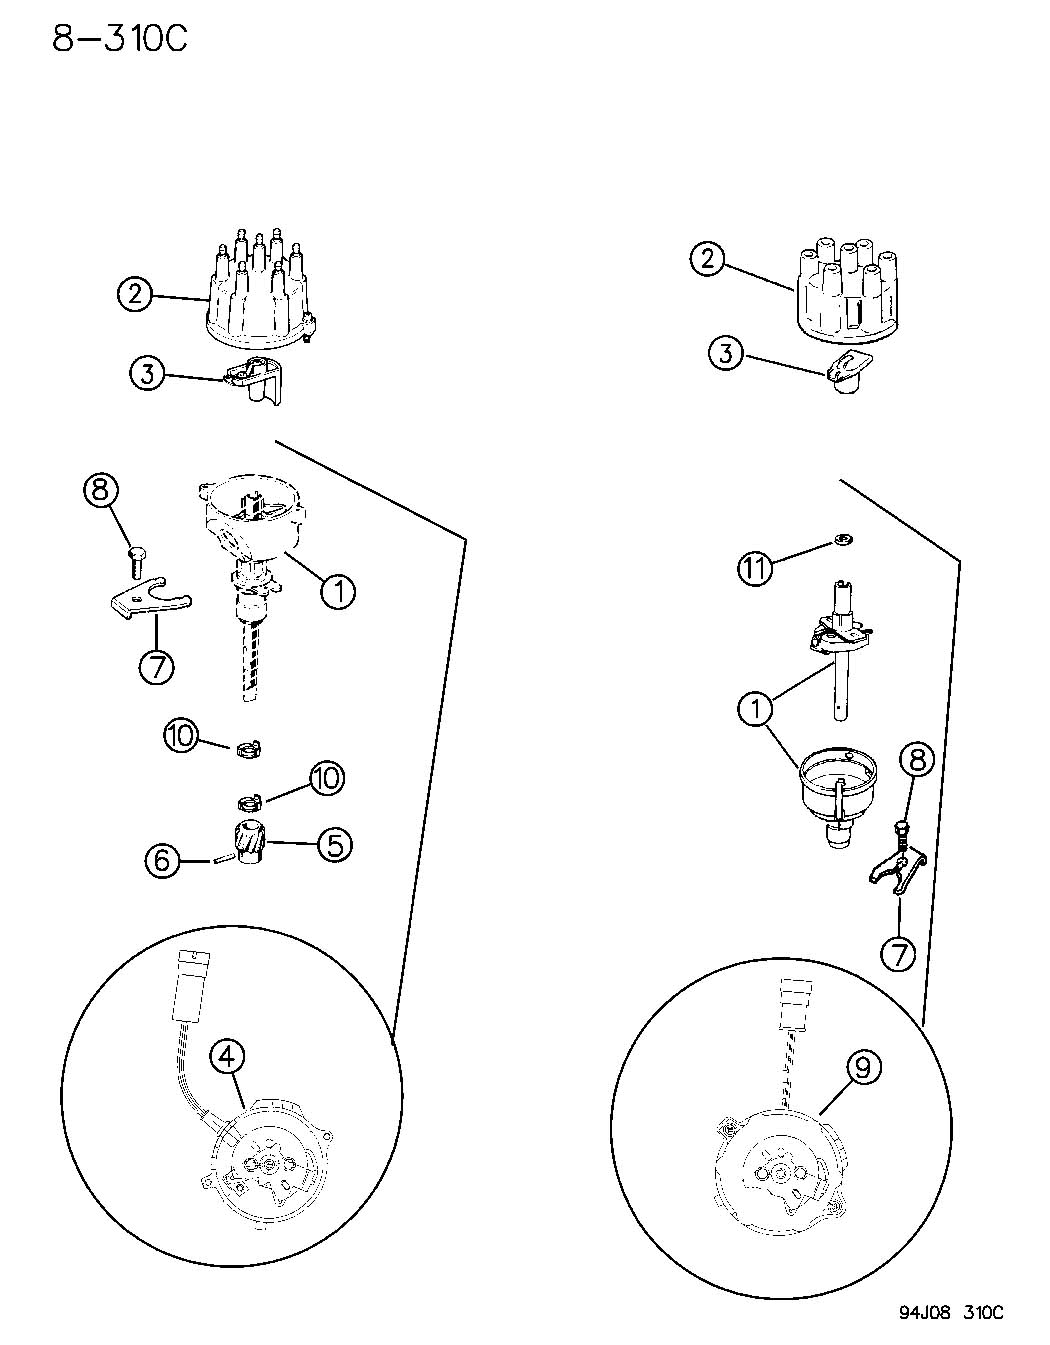 Jeep Wrangler Rotor Distributor Wdist Distributors